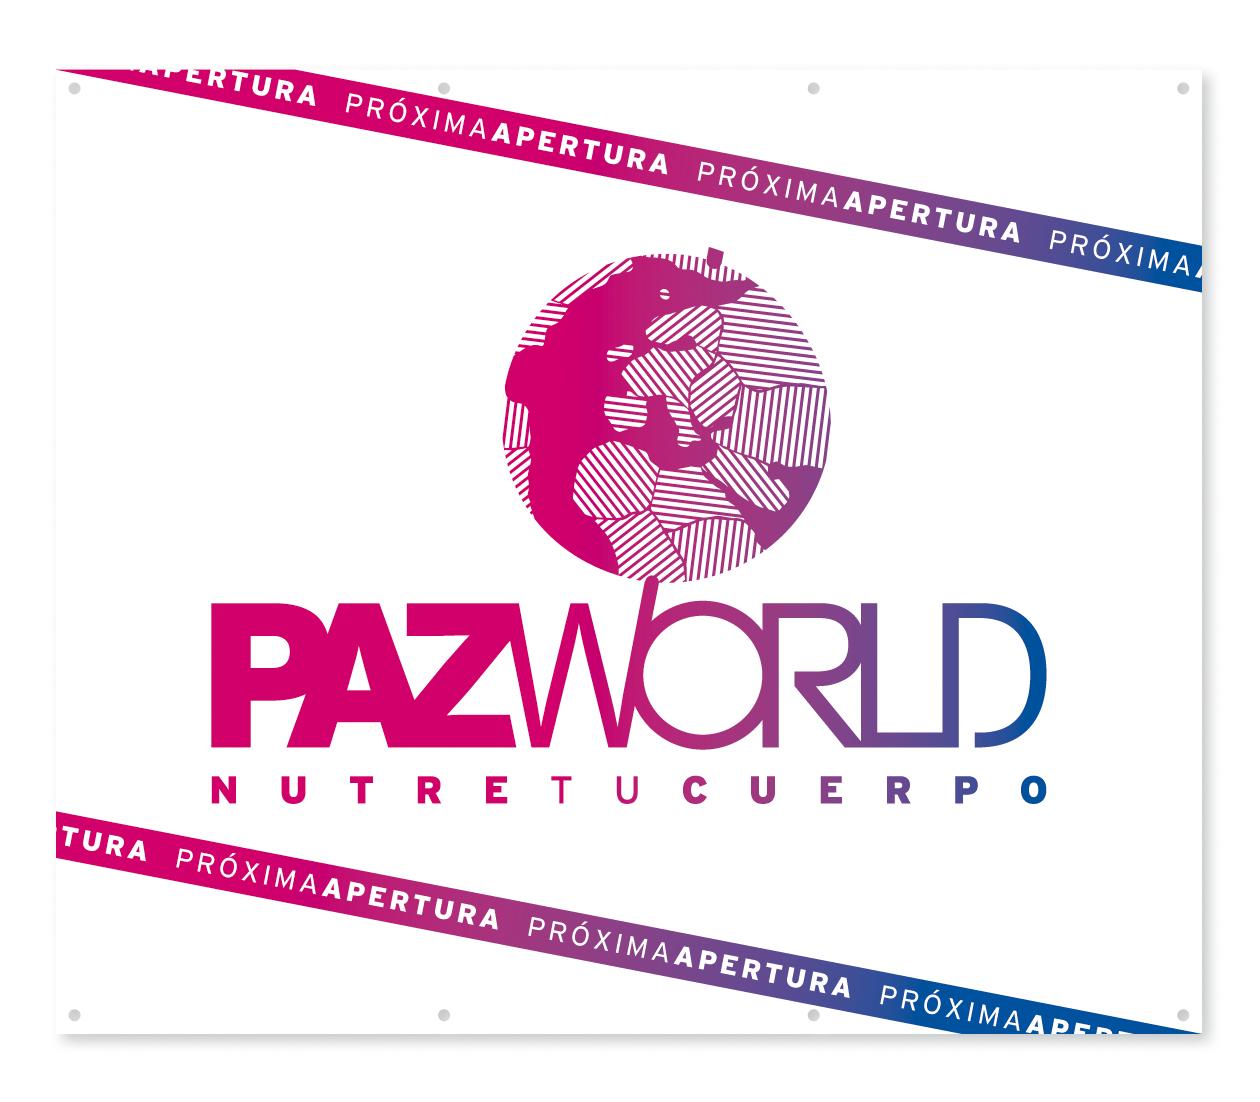 Lona de obra. PazWorld